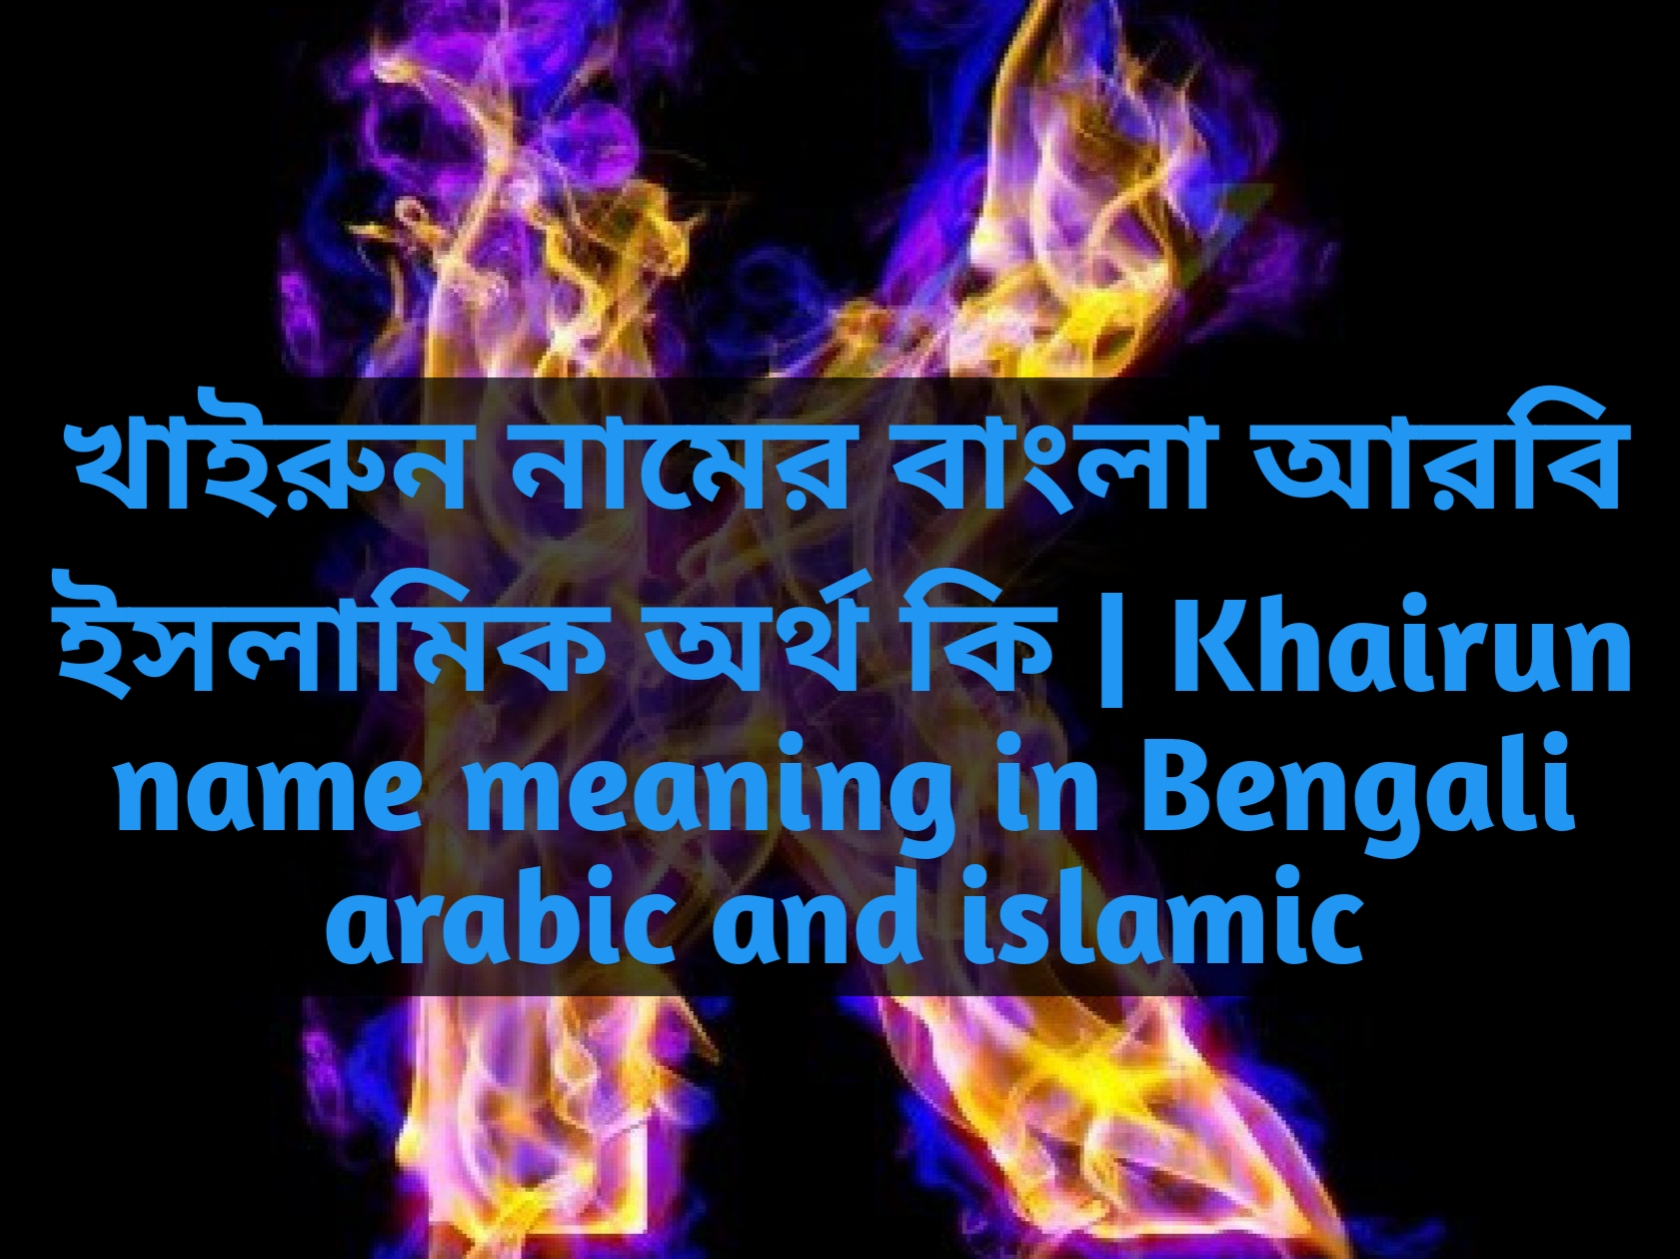 Khairun name meaning in Bengali, খাইরুন নামের অর্থ কি, খাইরুন নামের বাংলা অর্থ কি, খাইরুন নামের ইসলামিক অর্থ কি,